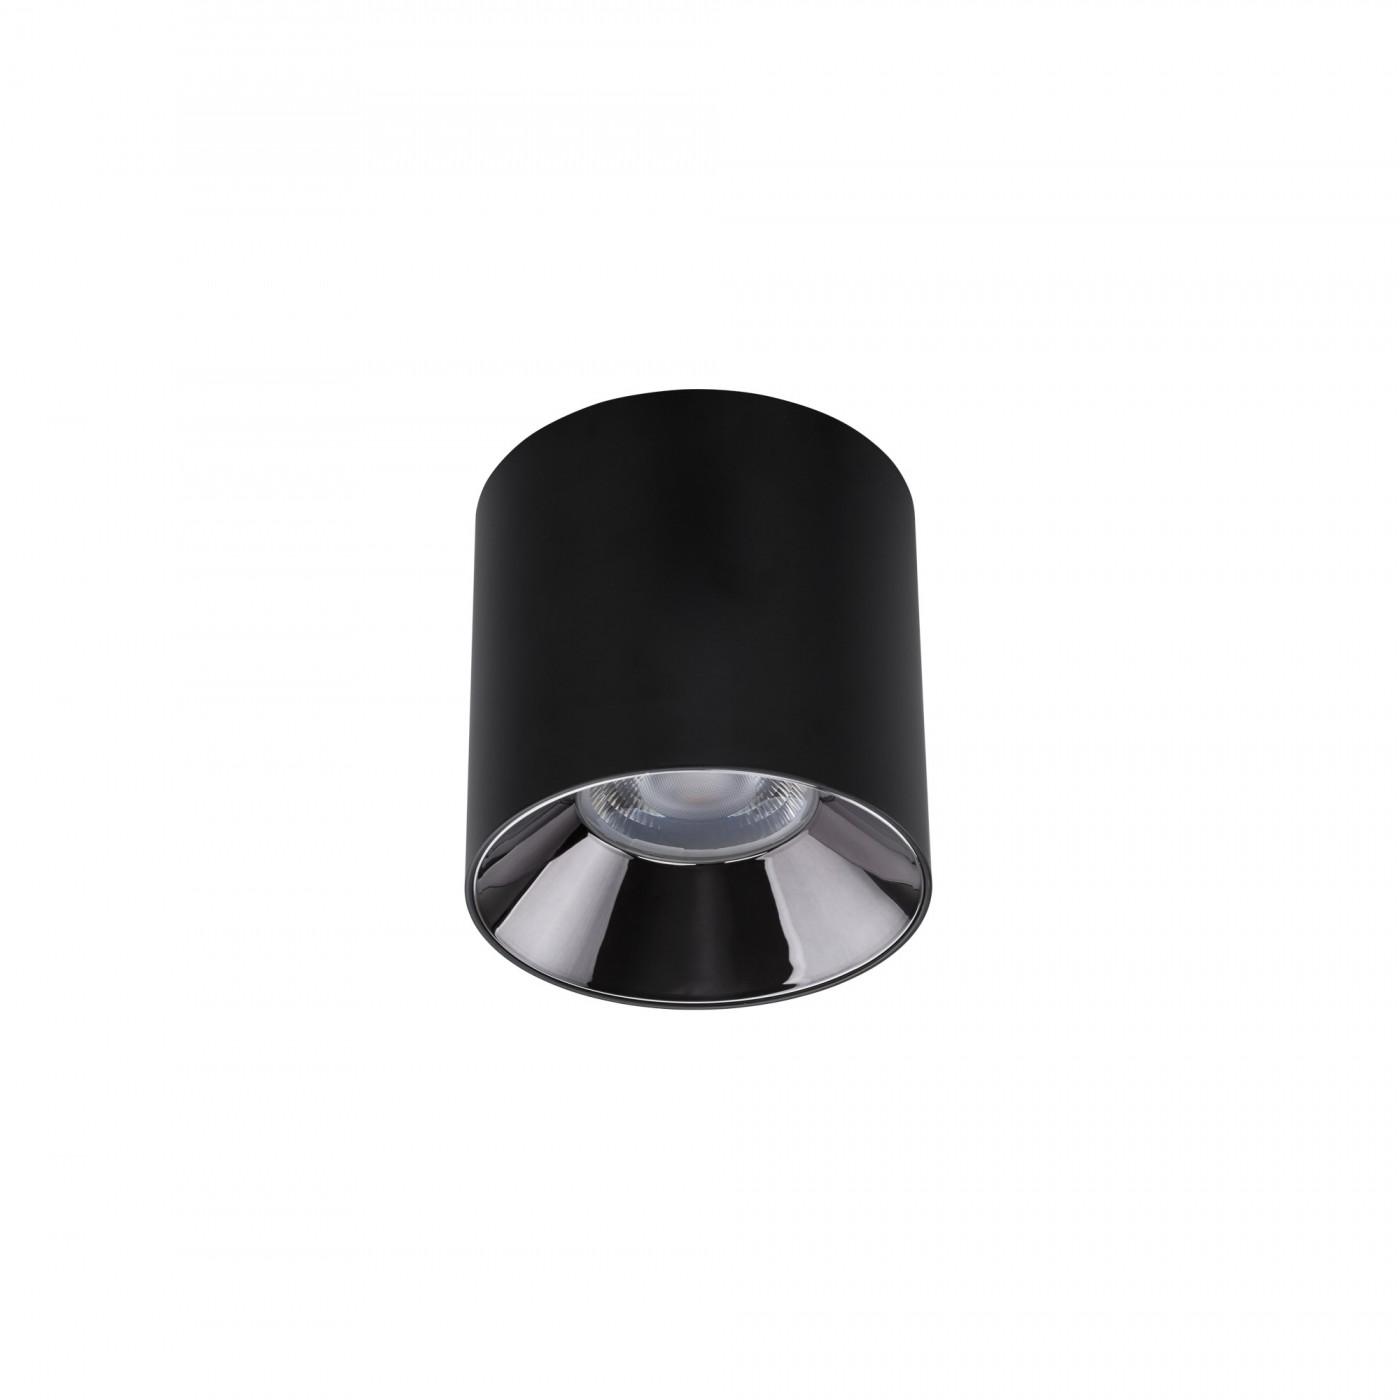 CL IOS LED 30W 4000K black 8727 Nowodvorski Lighting